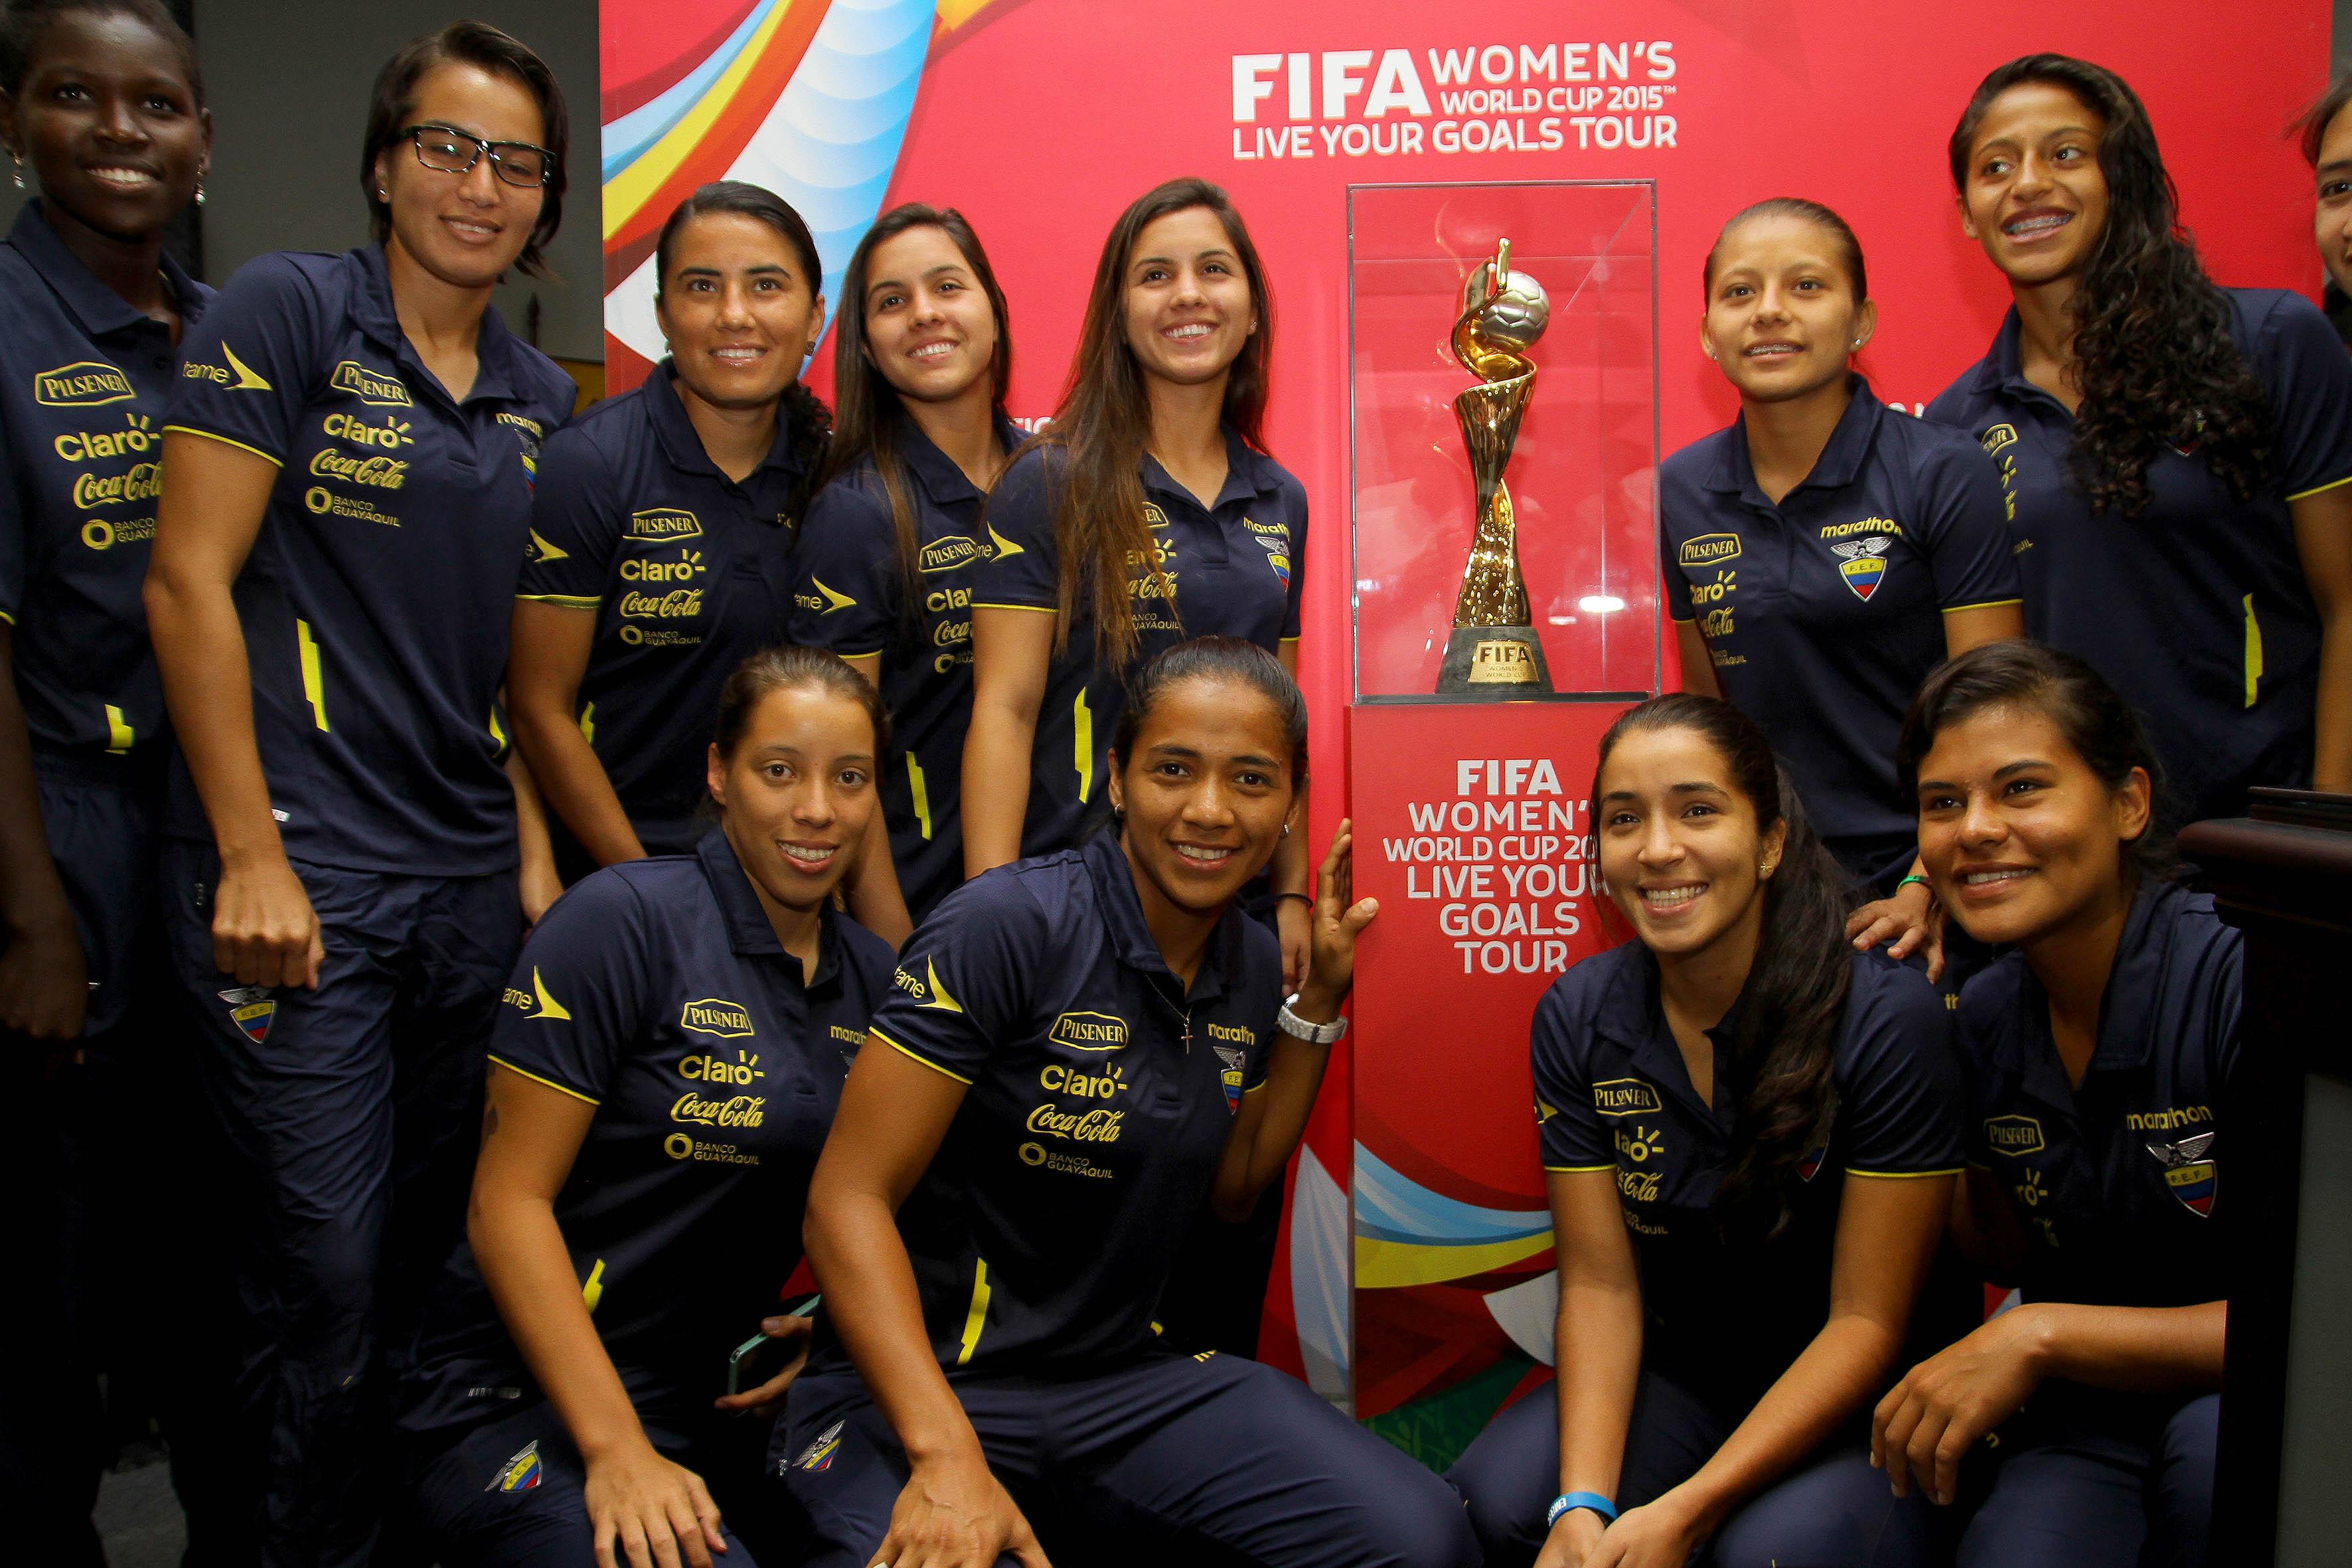 Ecuador women pictures